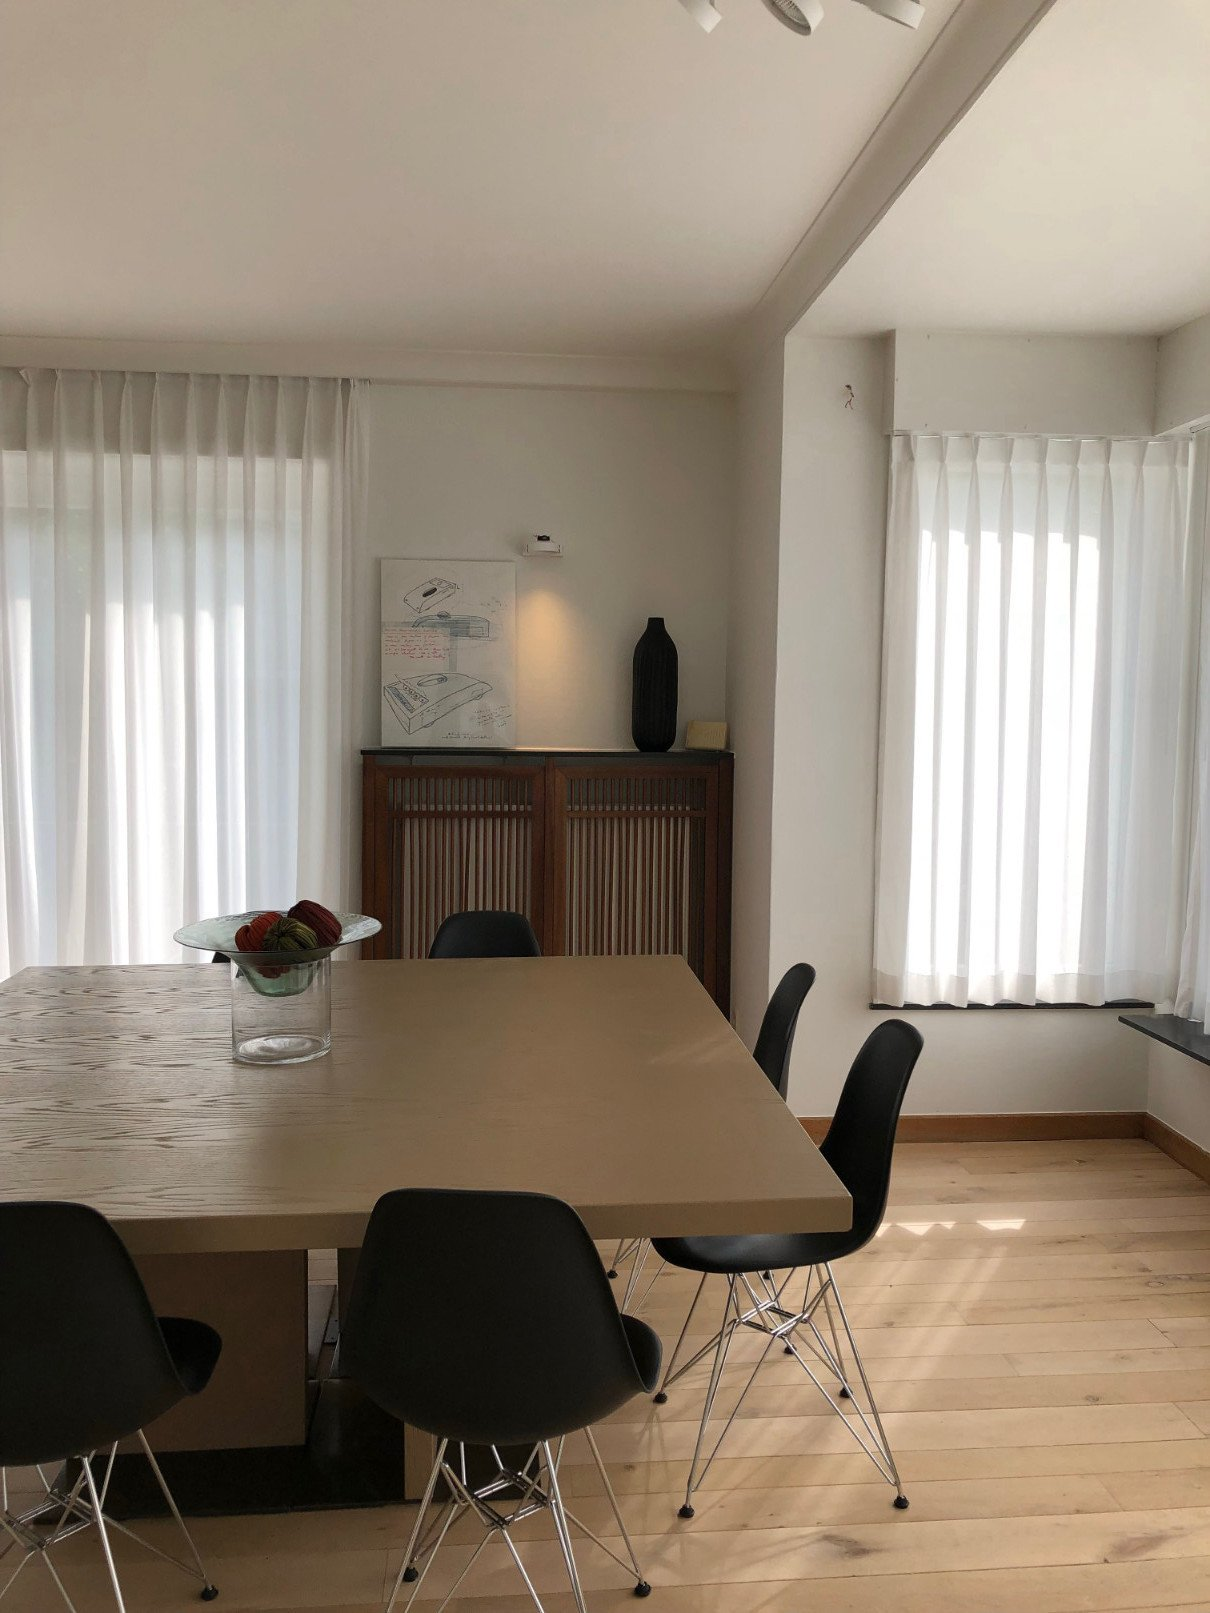 Rietveldprojects-Villa Were Di - Te Koop : Te Huur (per week)30.jpg